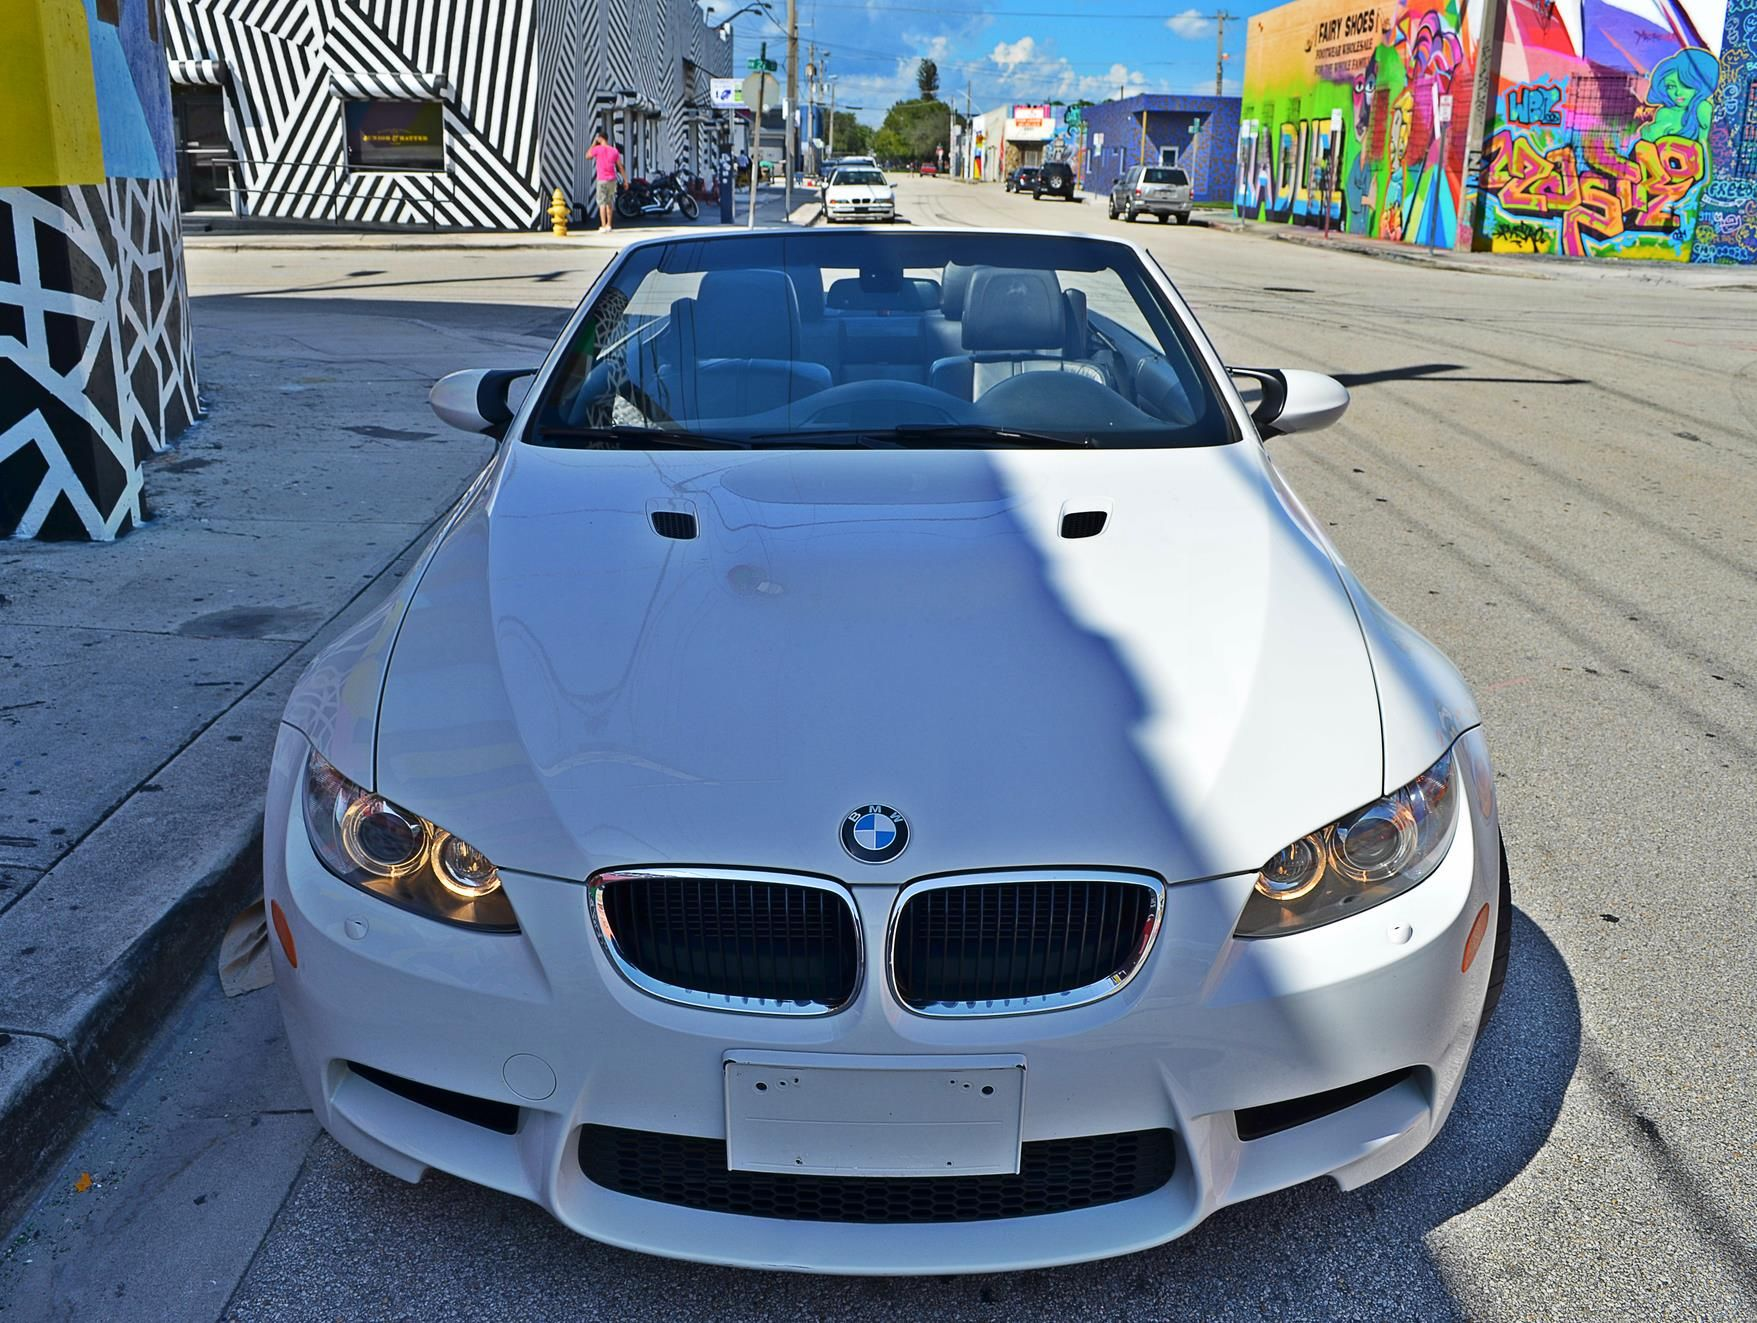 Bmw M3 Rental Car In Miami By Auto Boutique Rental A Luxury